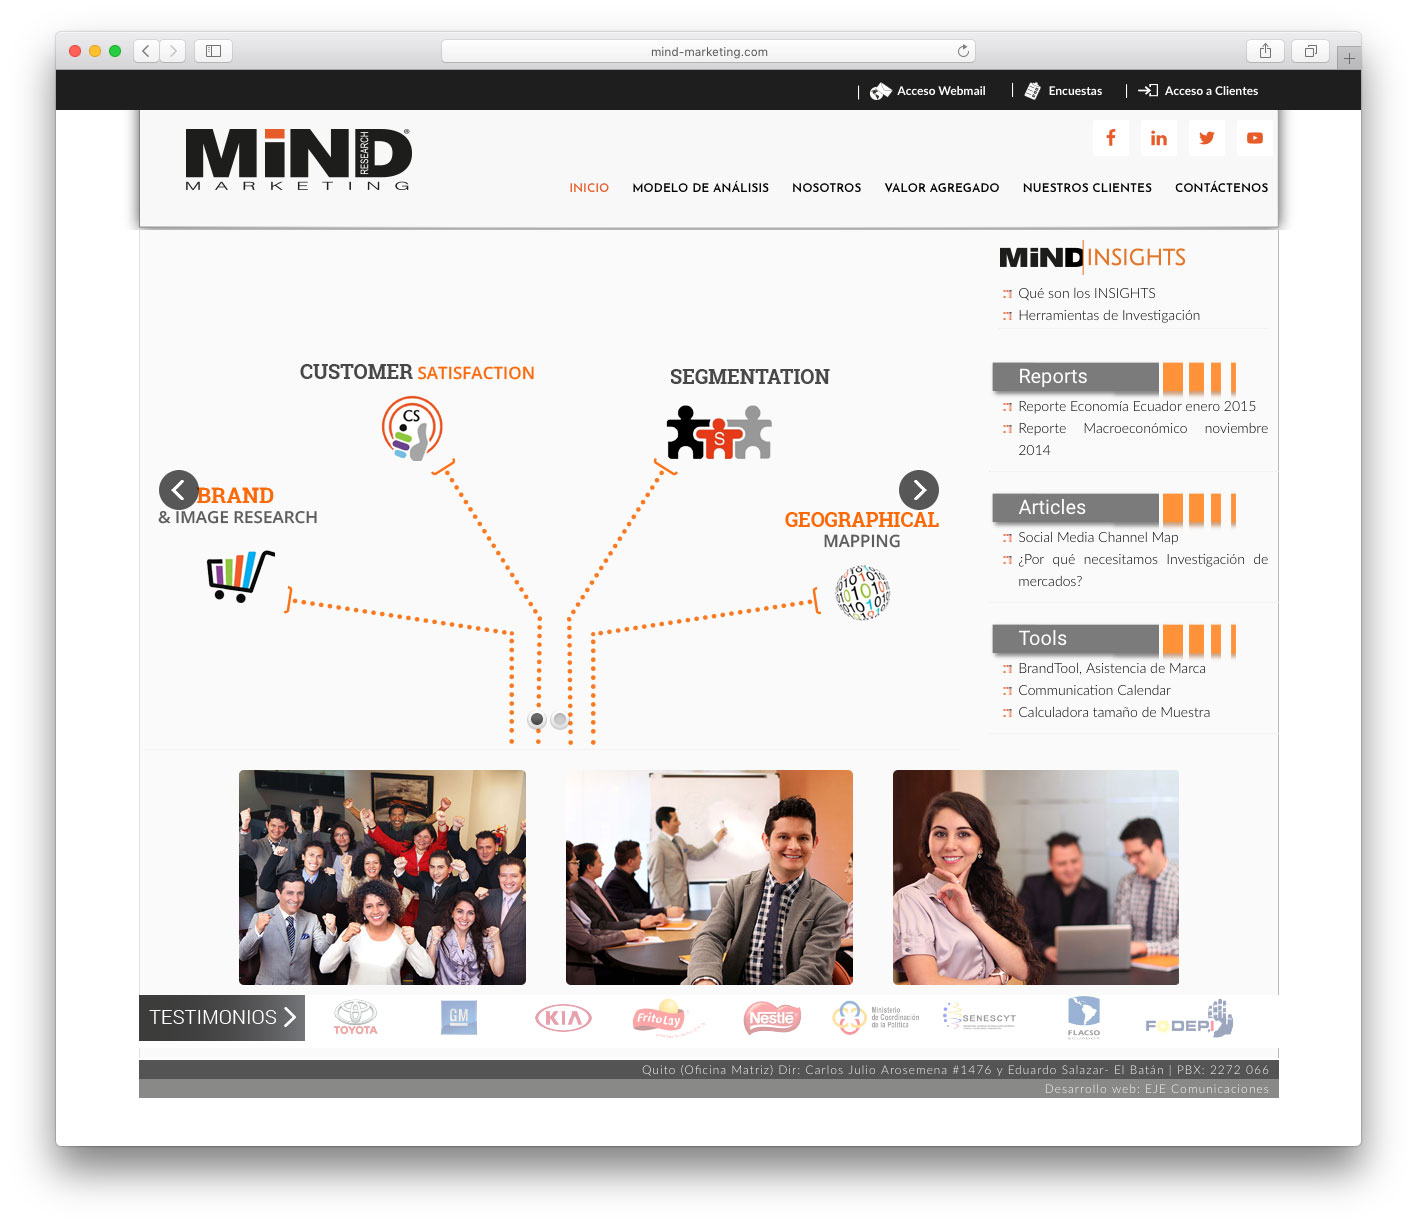 pagina-web-de-mind-marketing